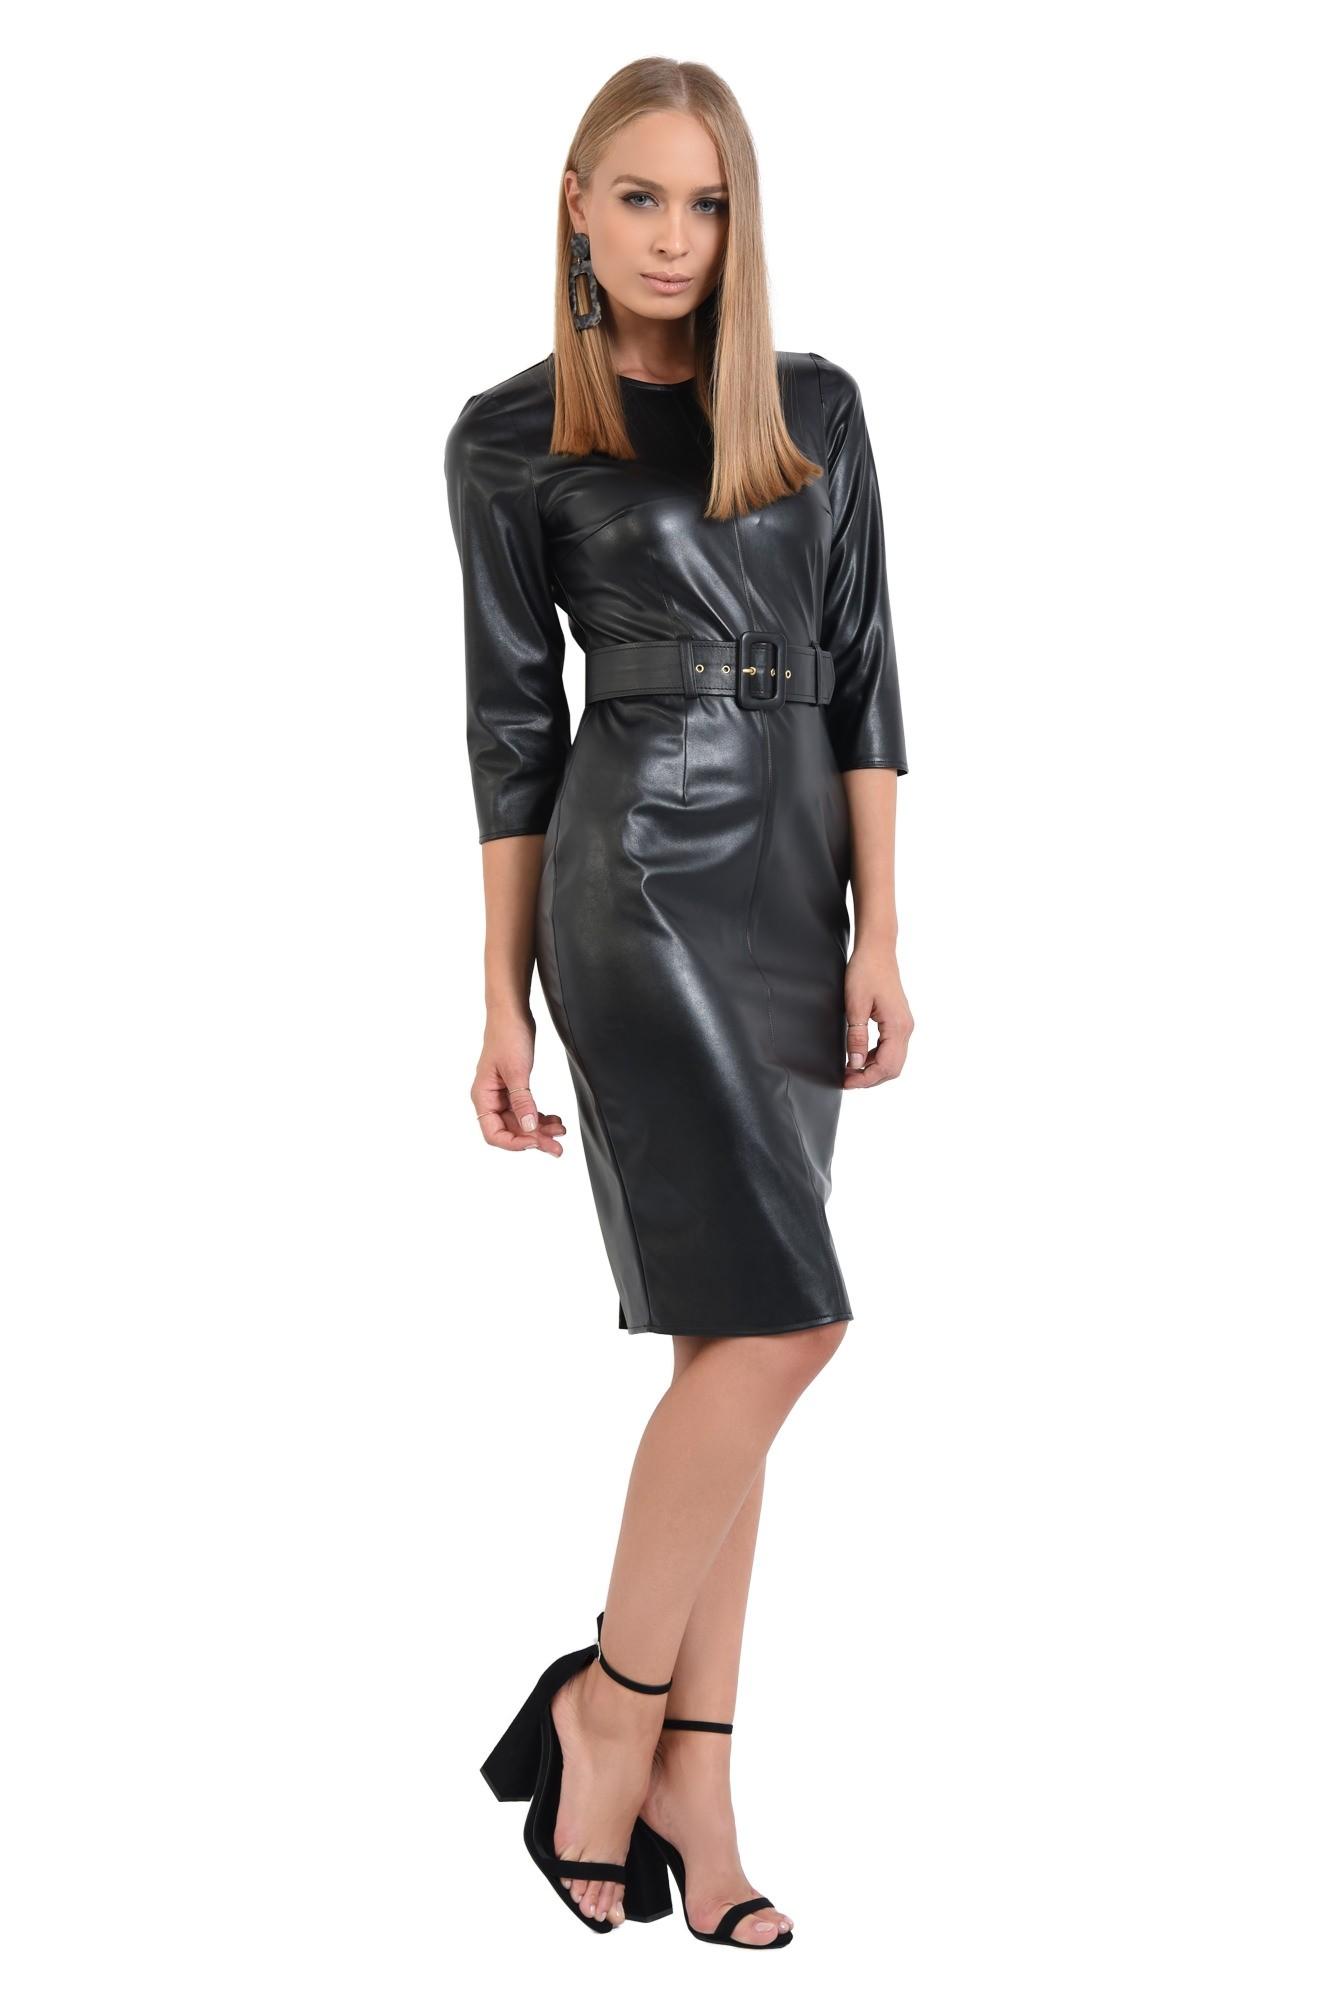 0 - rochie de toamna, neagra, croi conic, cu centura